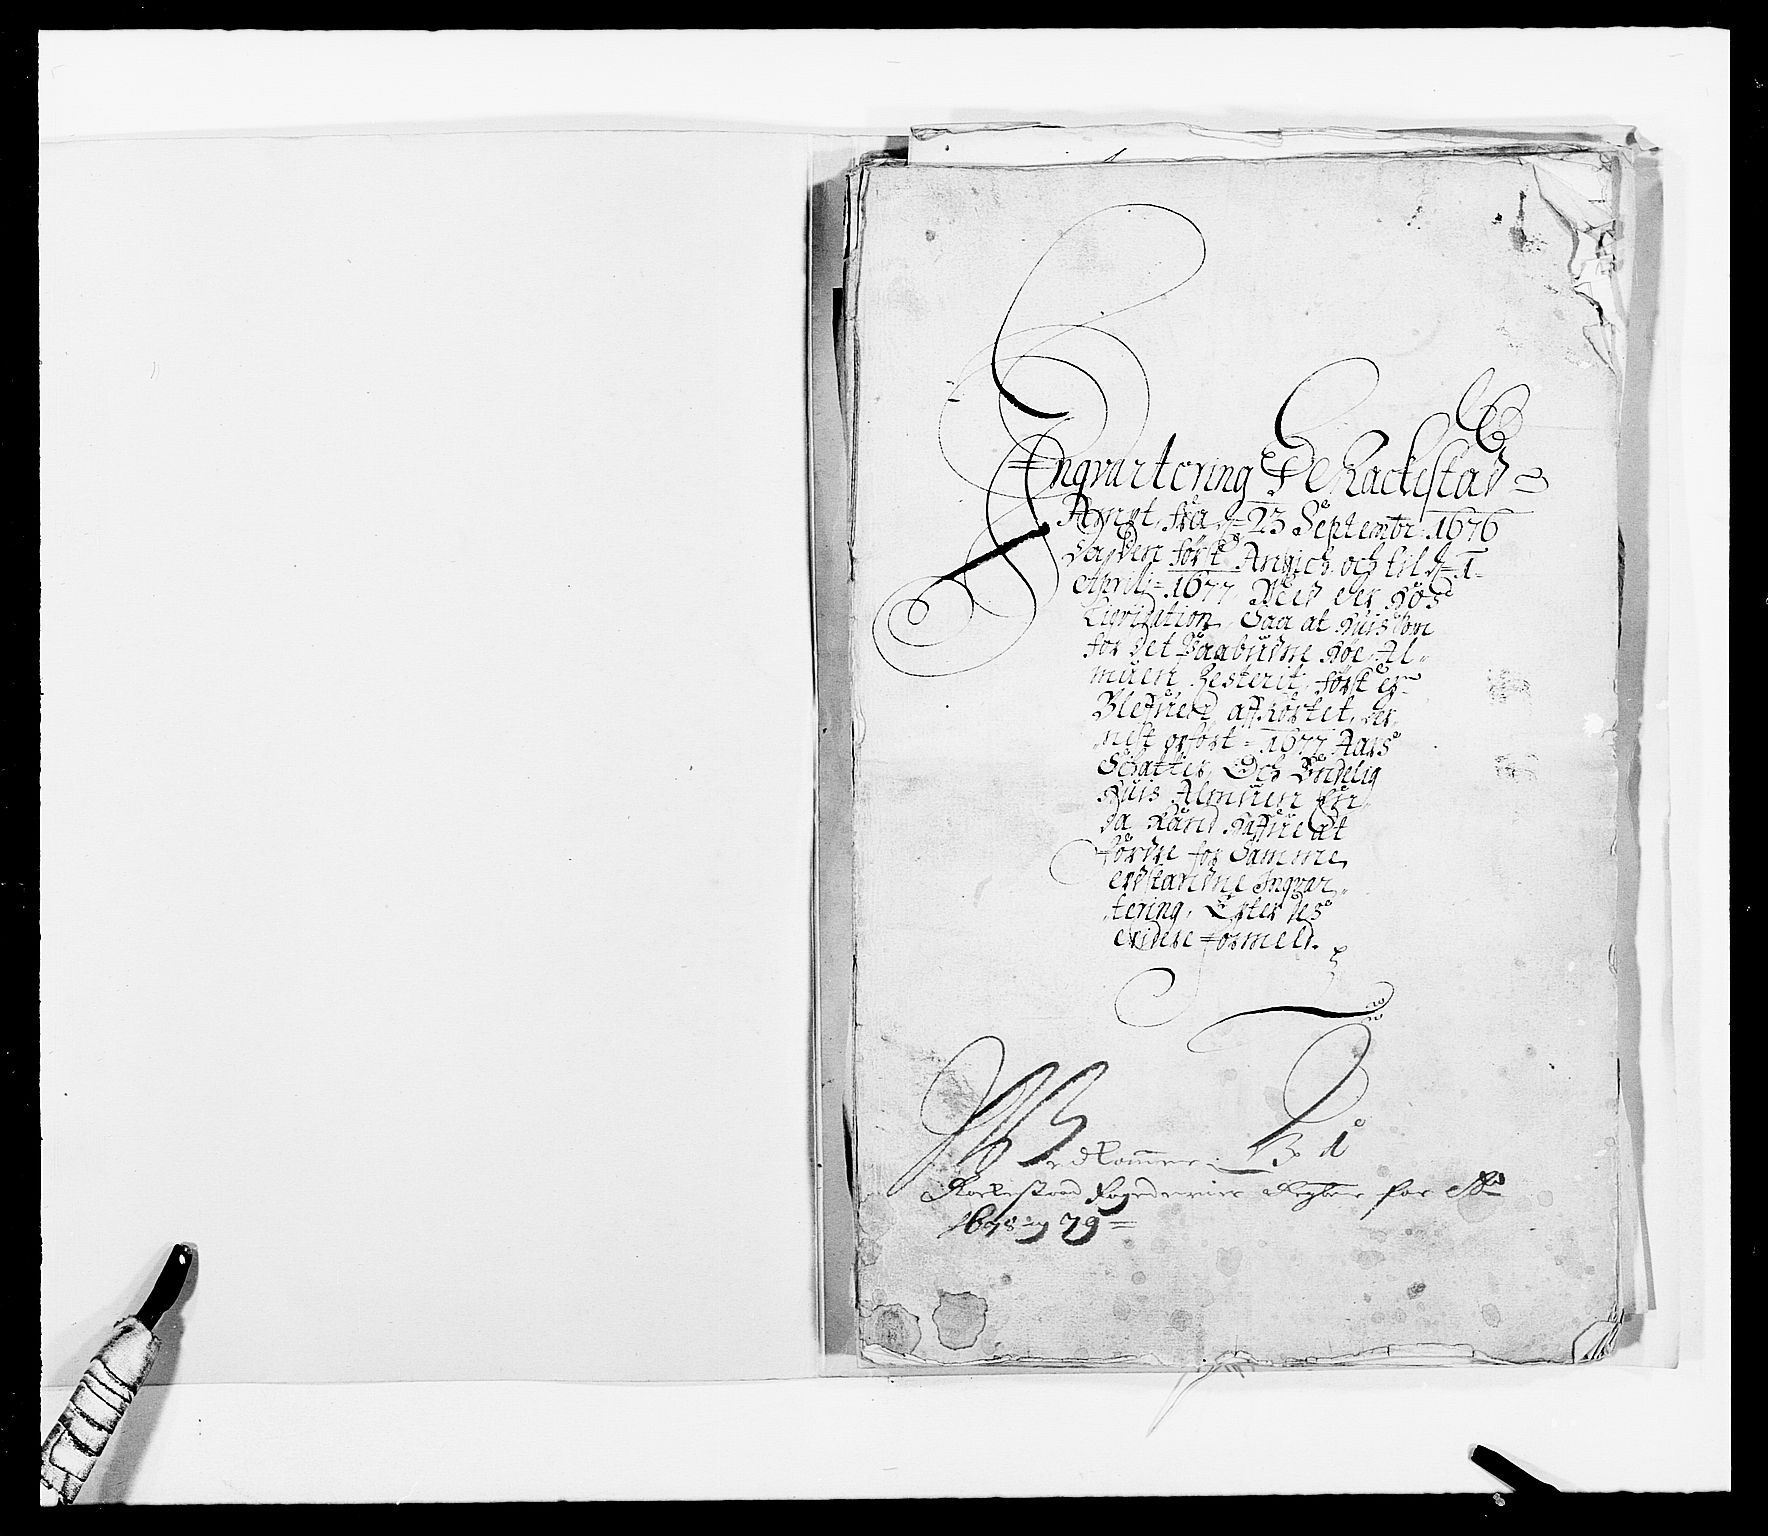 RA, Rentekammeret inntil 1814, Reviderte regnskaper, Fogderegnskap, R05/L0271: Fogderegnskap Rakkestad, 1678-1679, s. 491